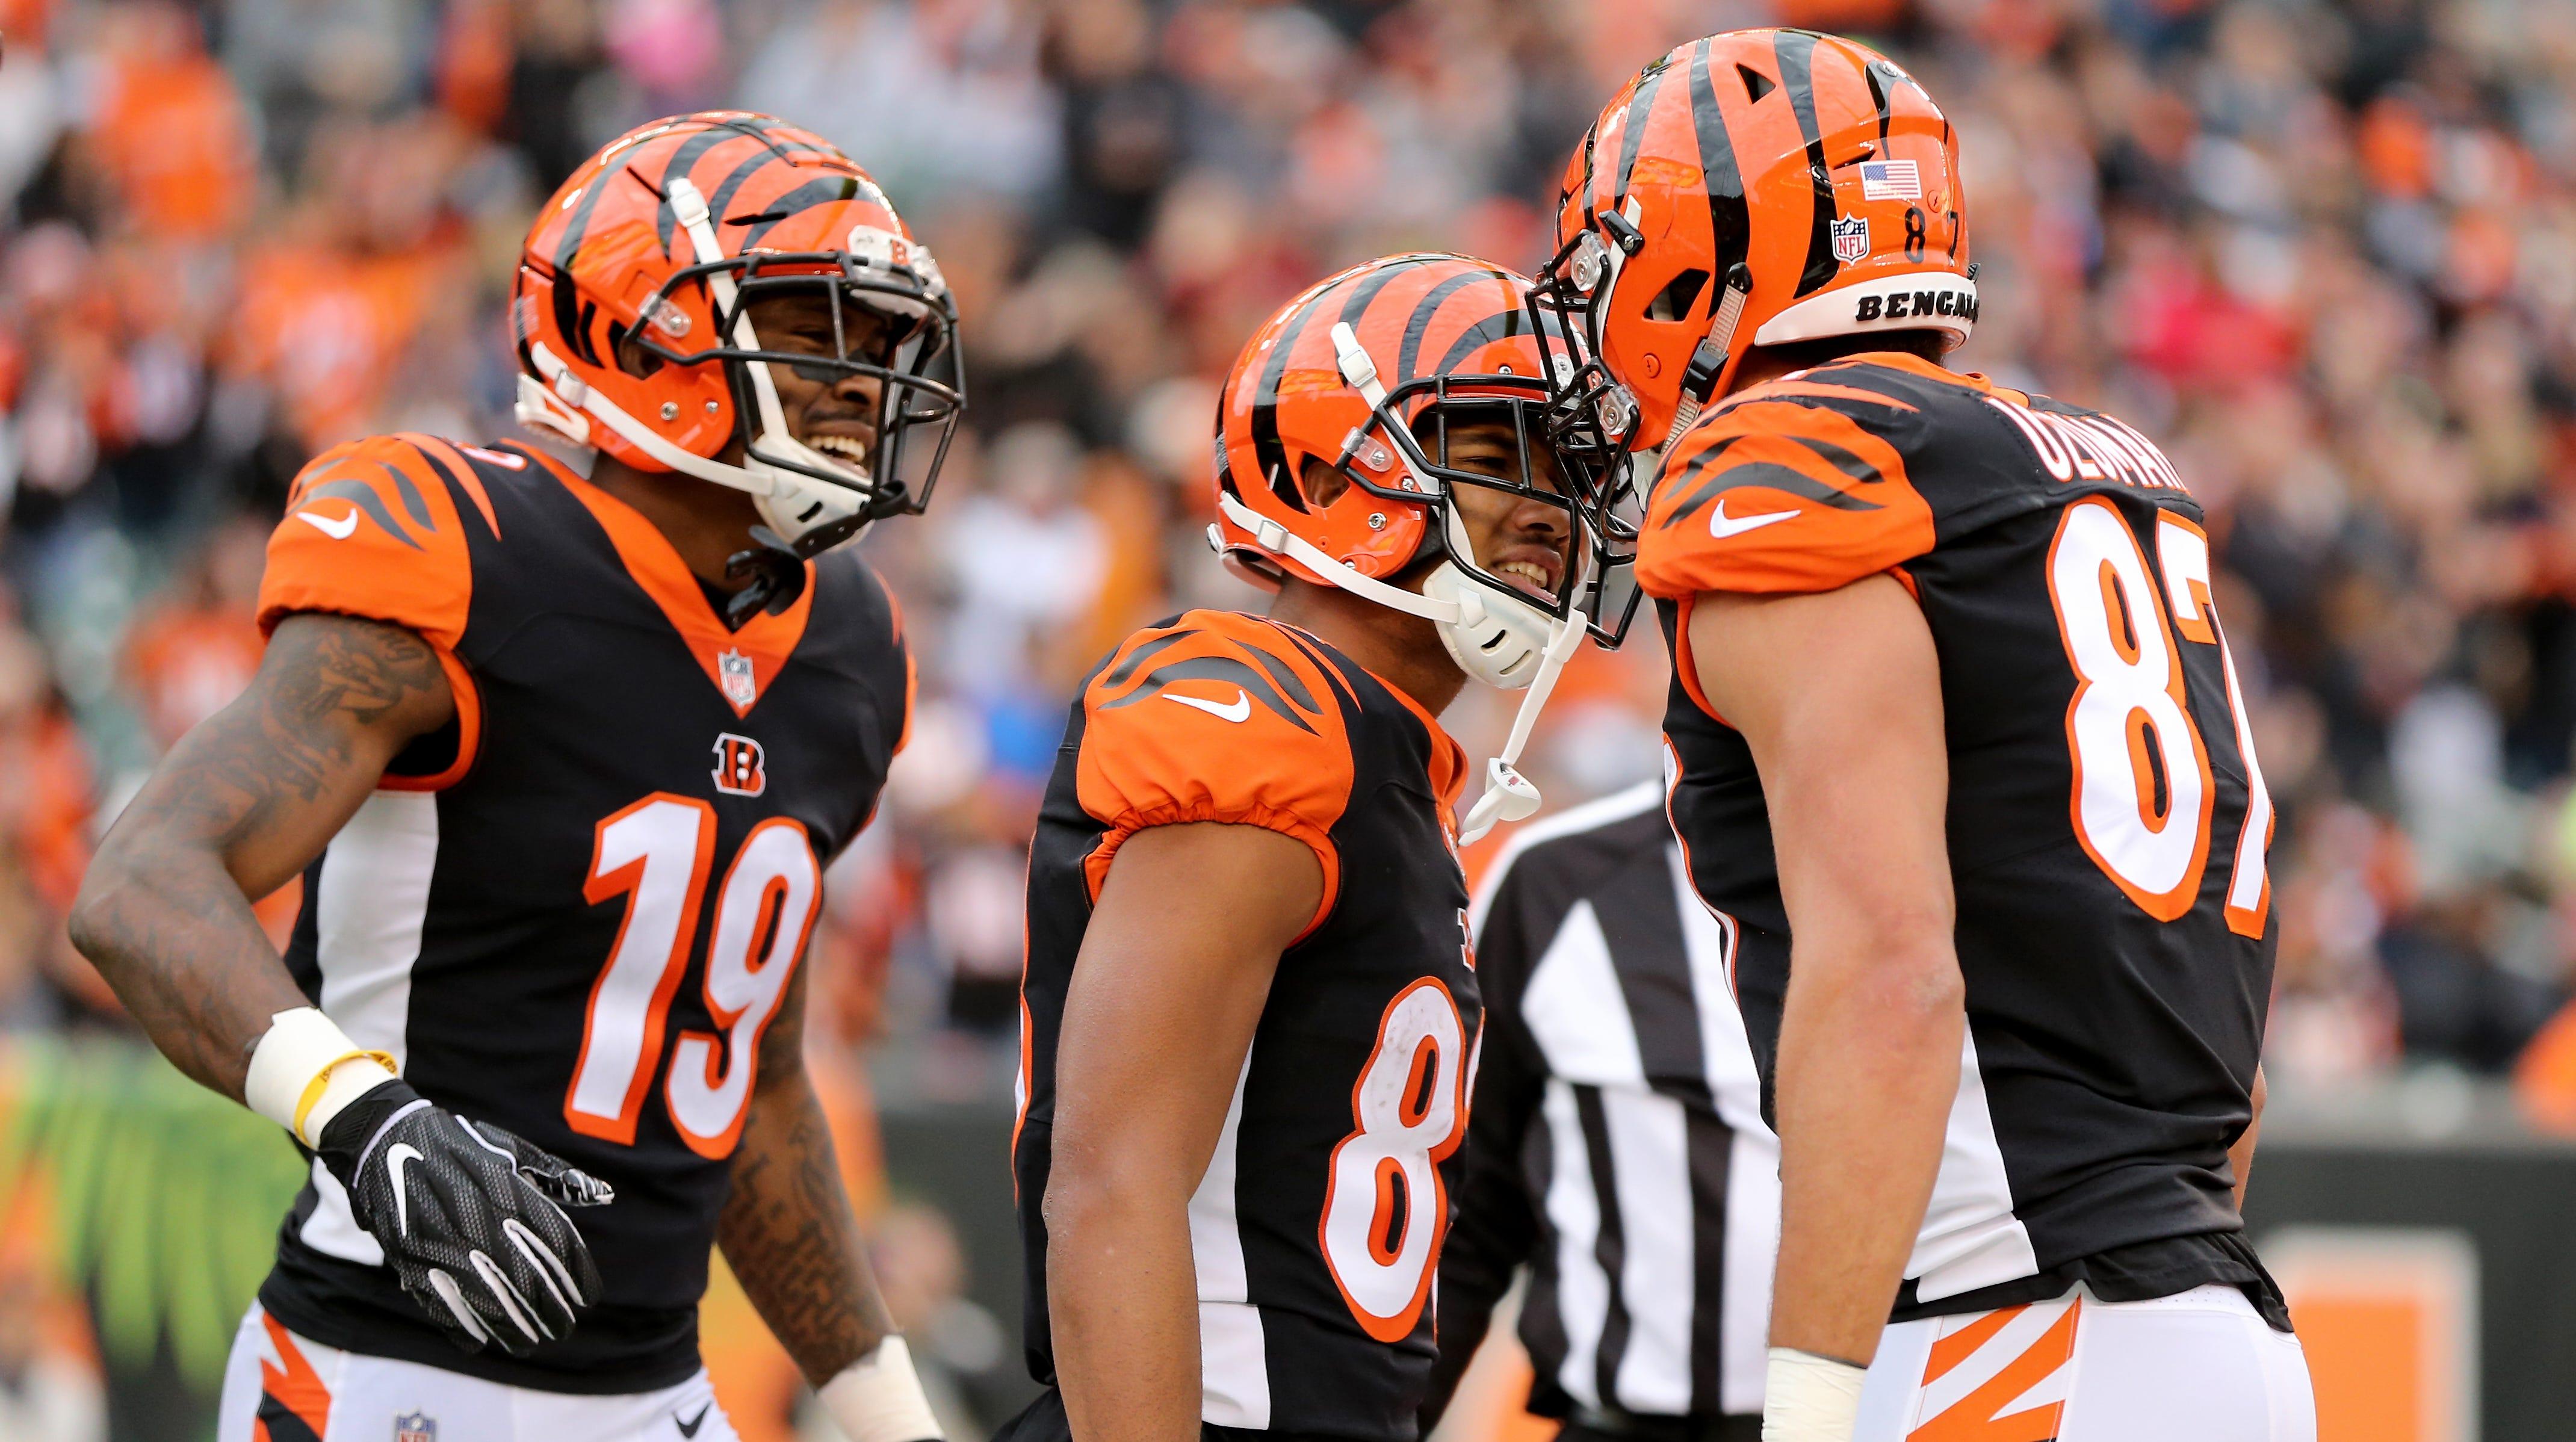 Cincinnati Bengals Vs Denver Broncos Tv Odds History And More